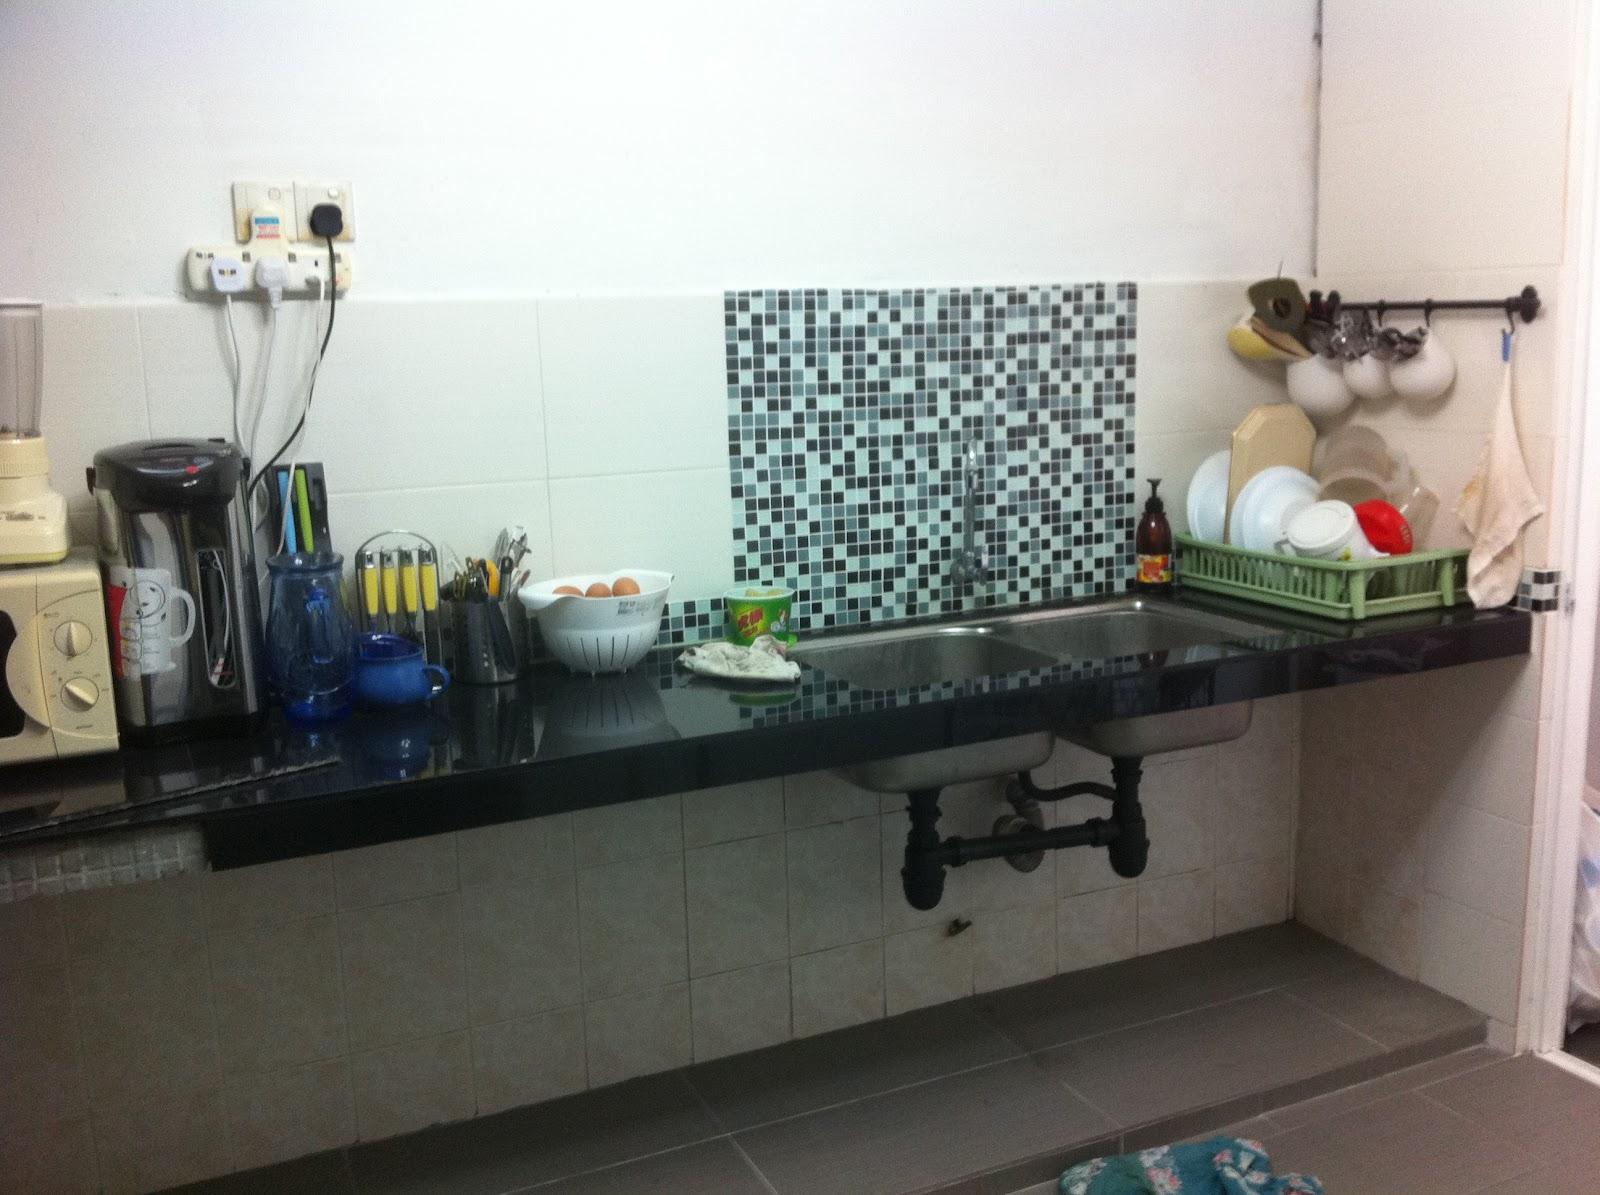 Dekorasi Dapur Tanpa Kabinet Kumpulan Dekorasi Terlengkap